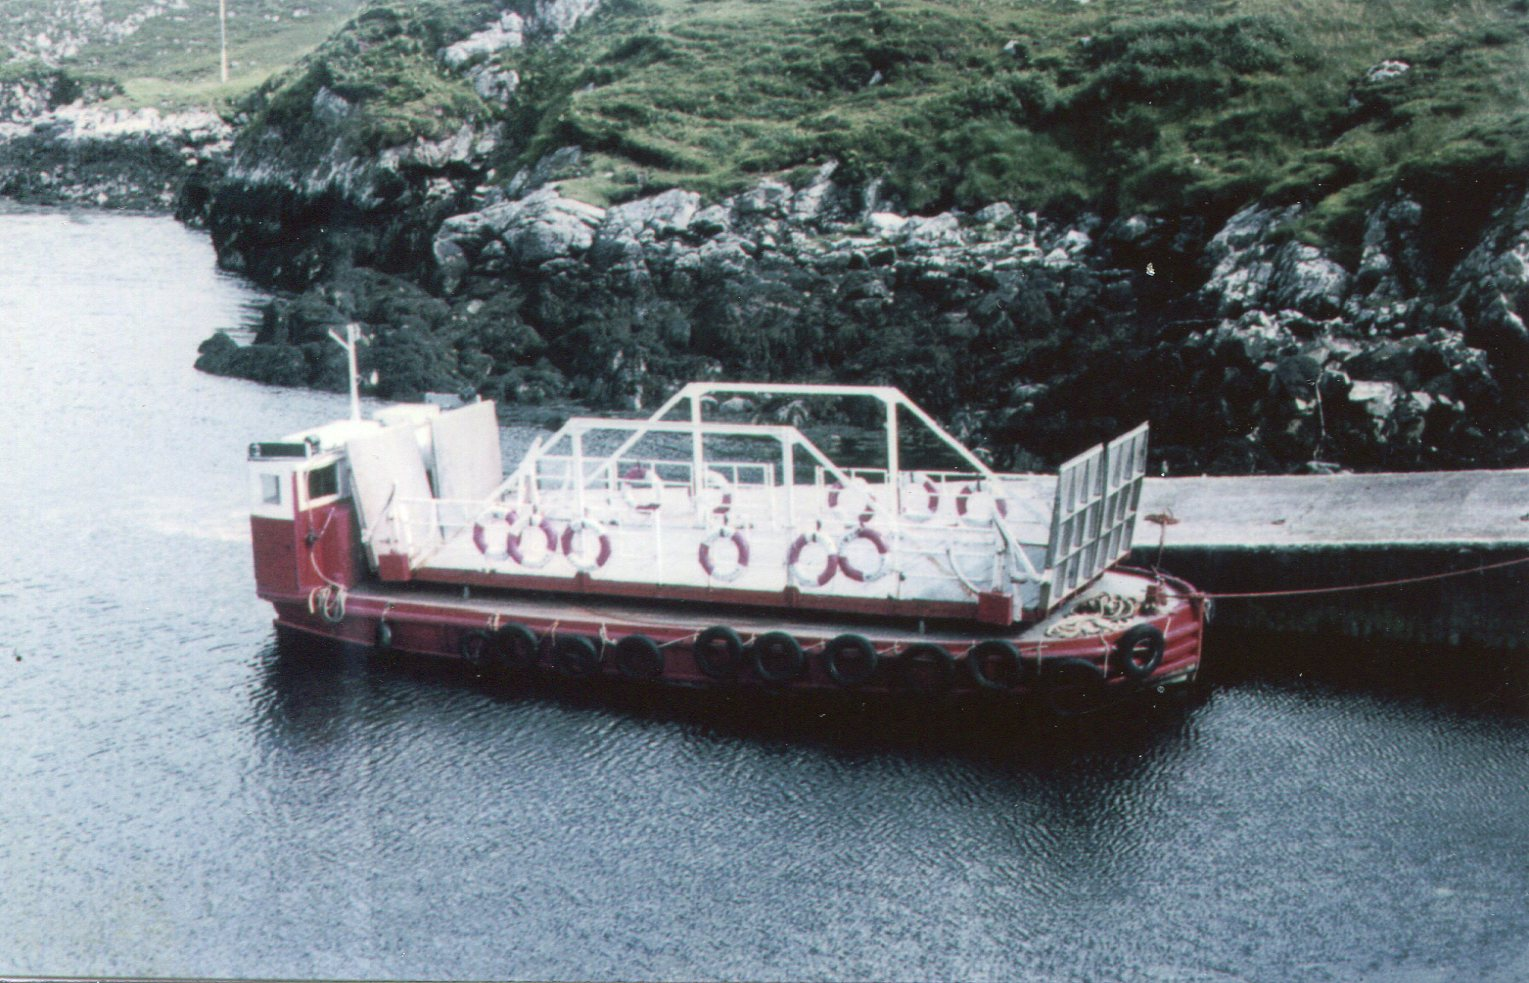 Scalpay (I) ex Maid Of Glencoe (II) at the Scalpay slip in July 1969